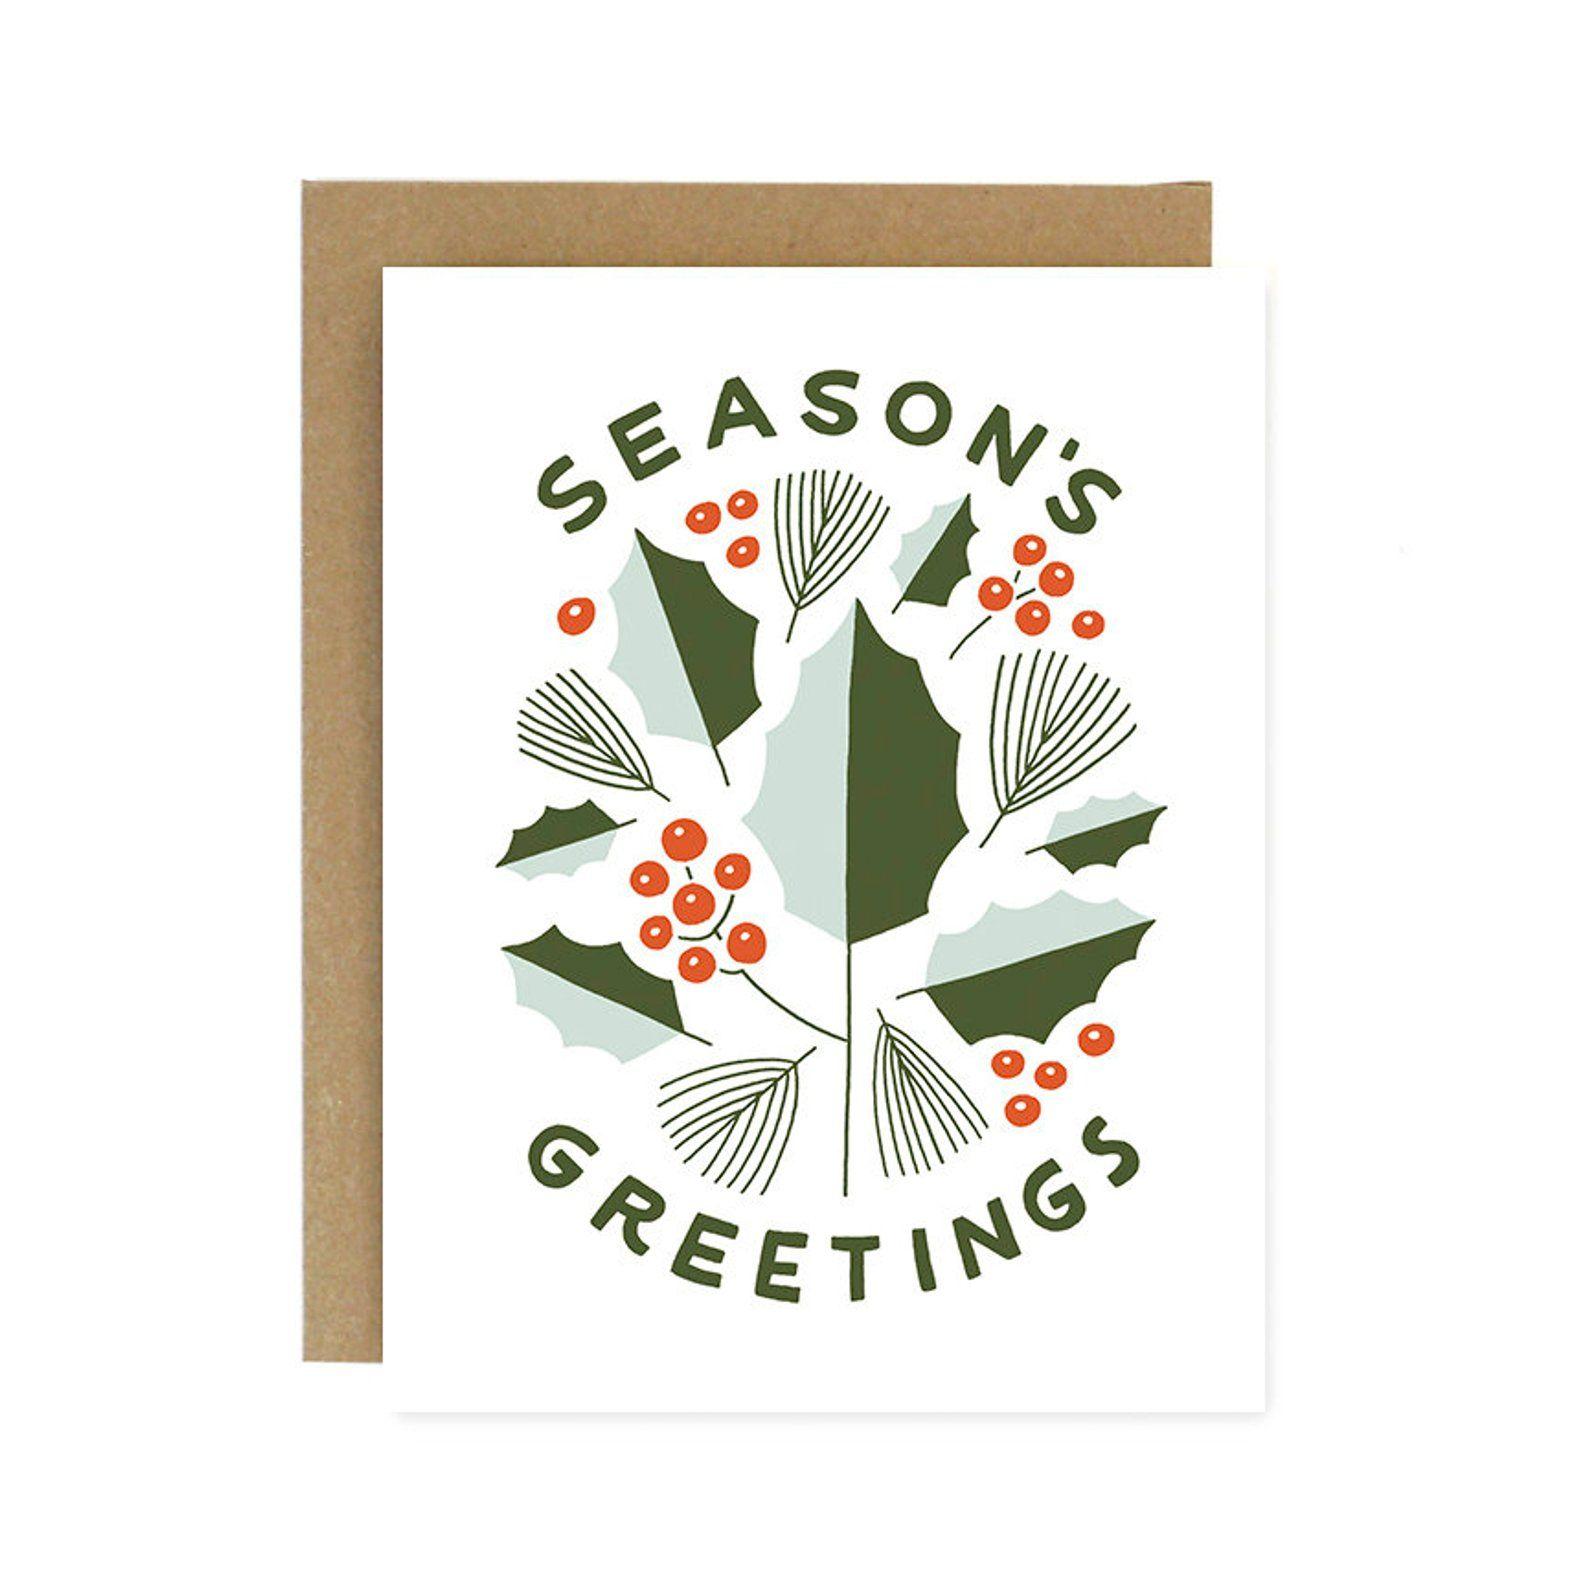 Season's Greetings Holly Card Cards, Holiday greeting